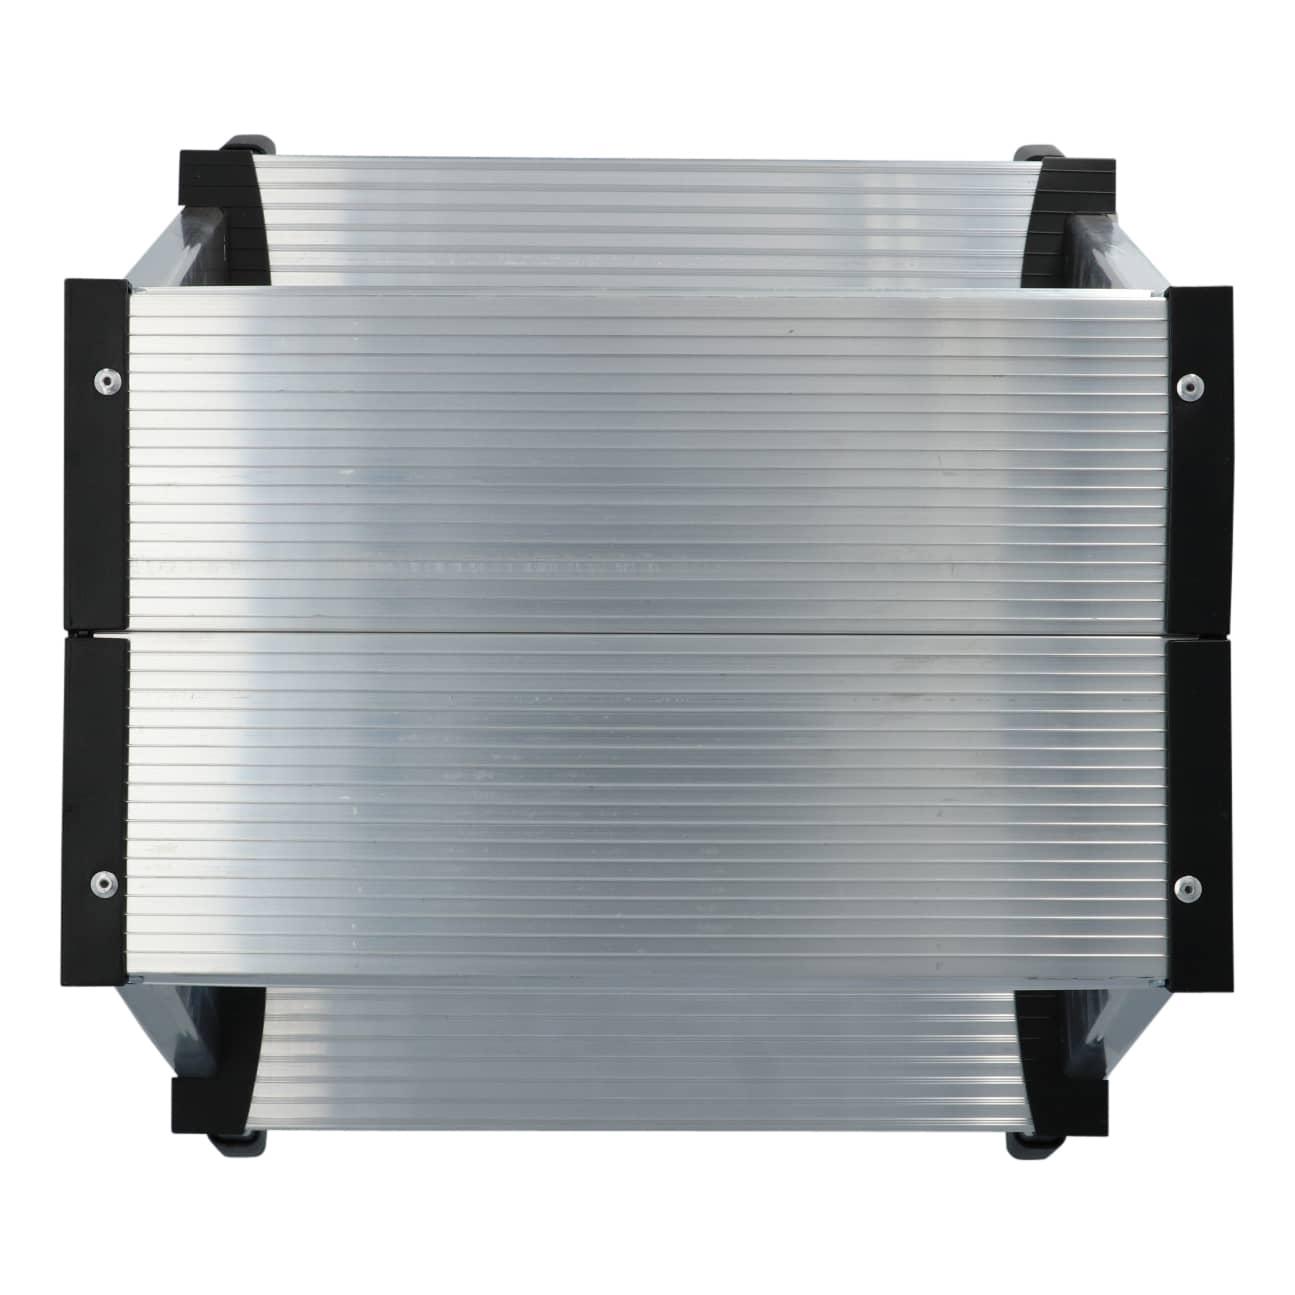 4goodz Stevige aluminium keukentrap met 2 treden - M - 40,5x48x40 cm